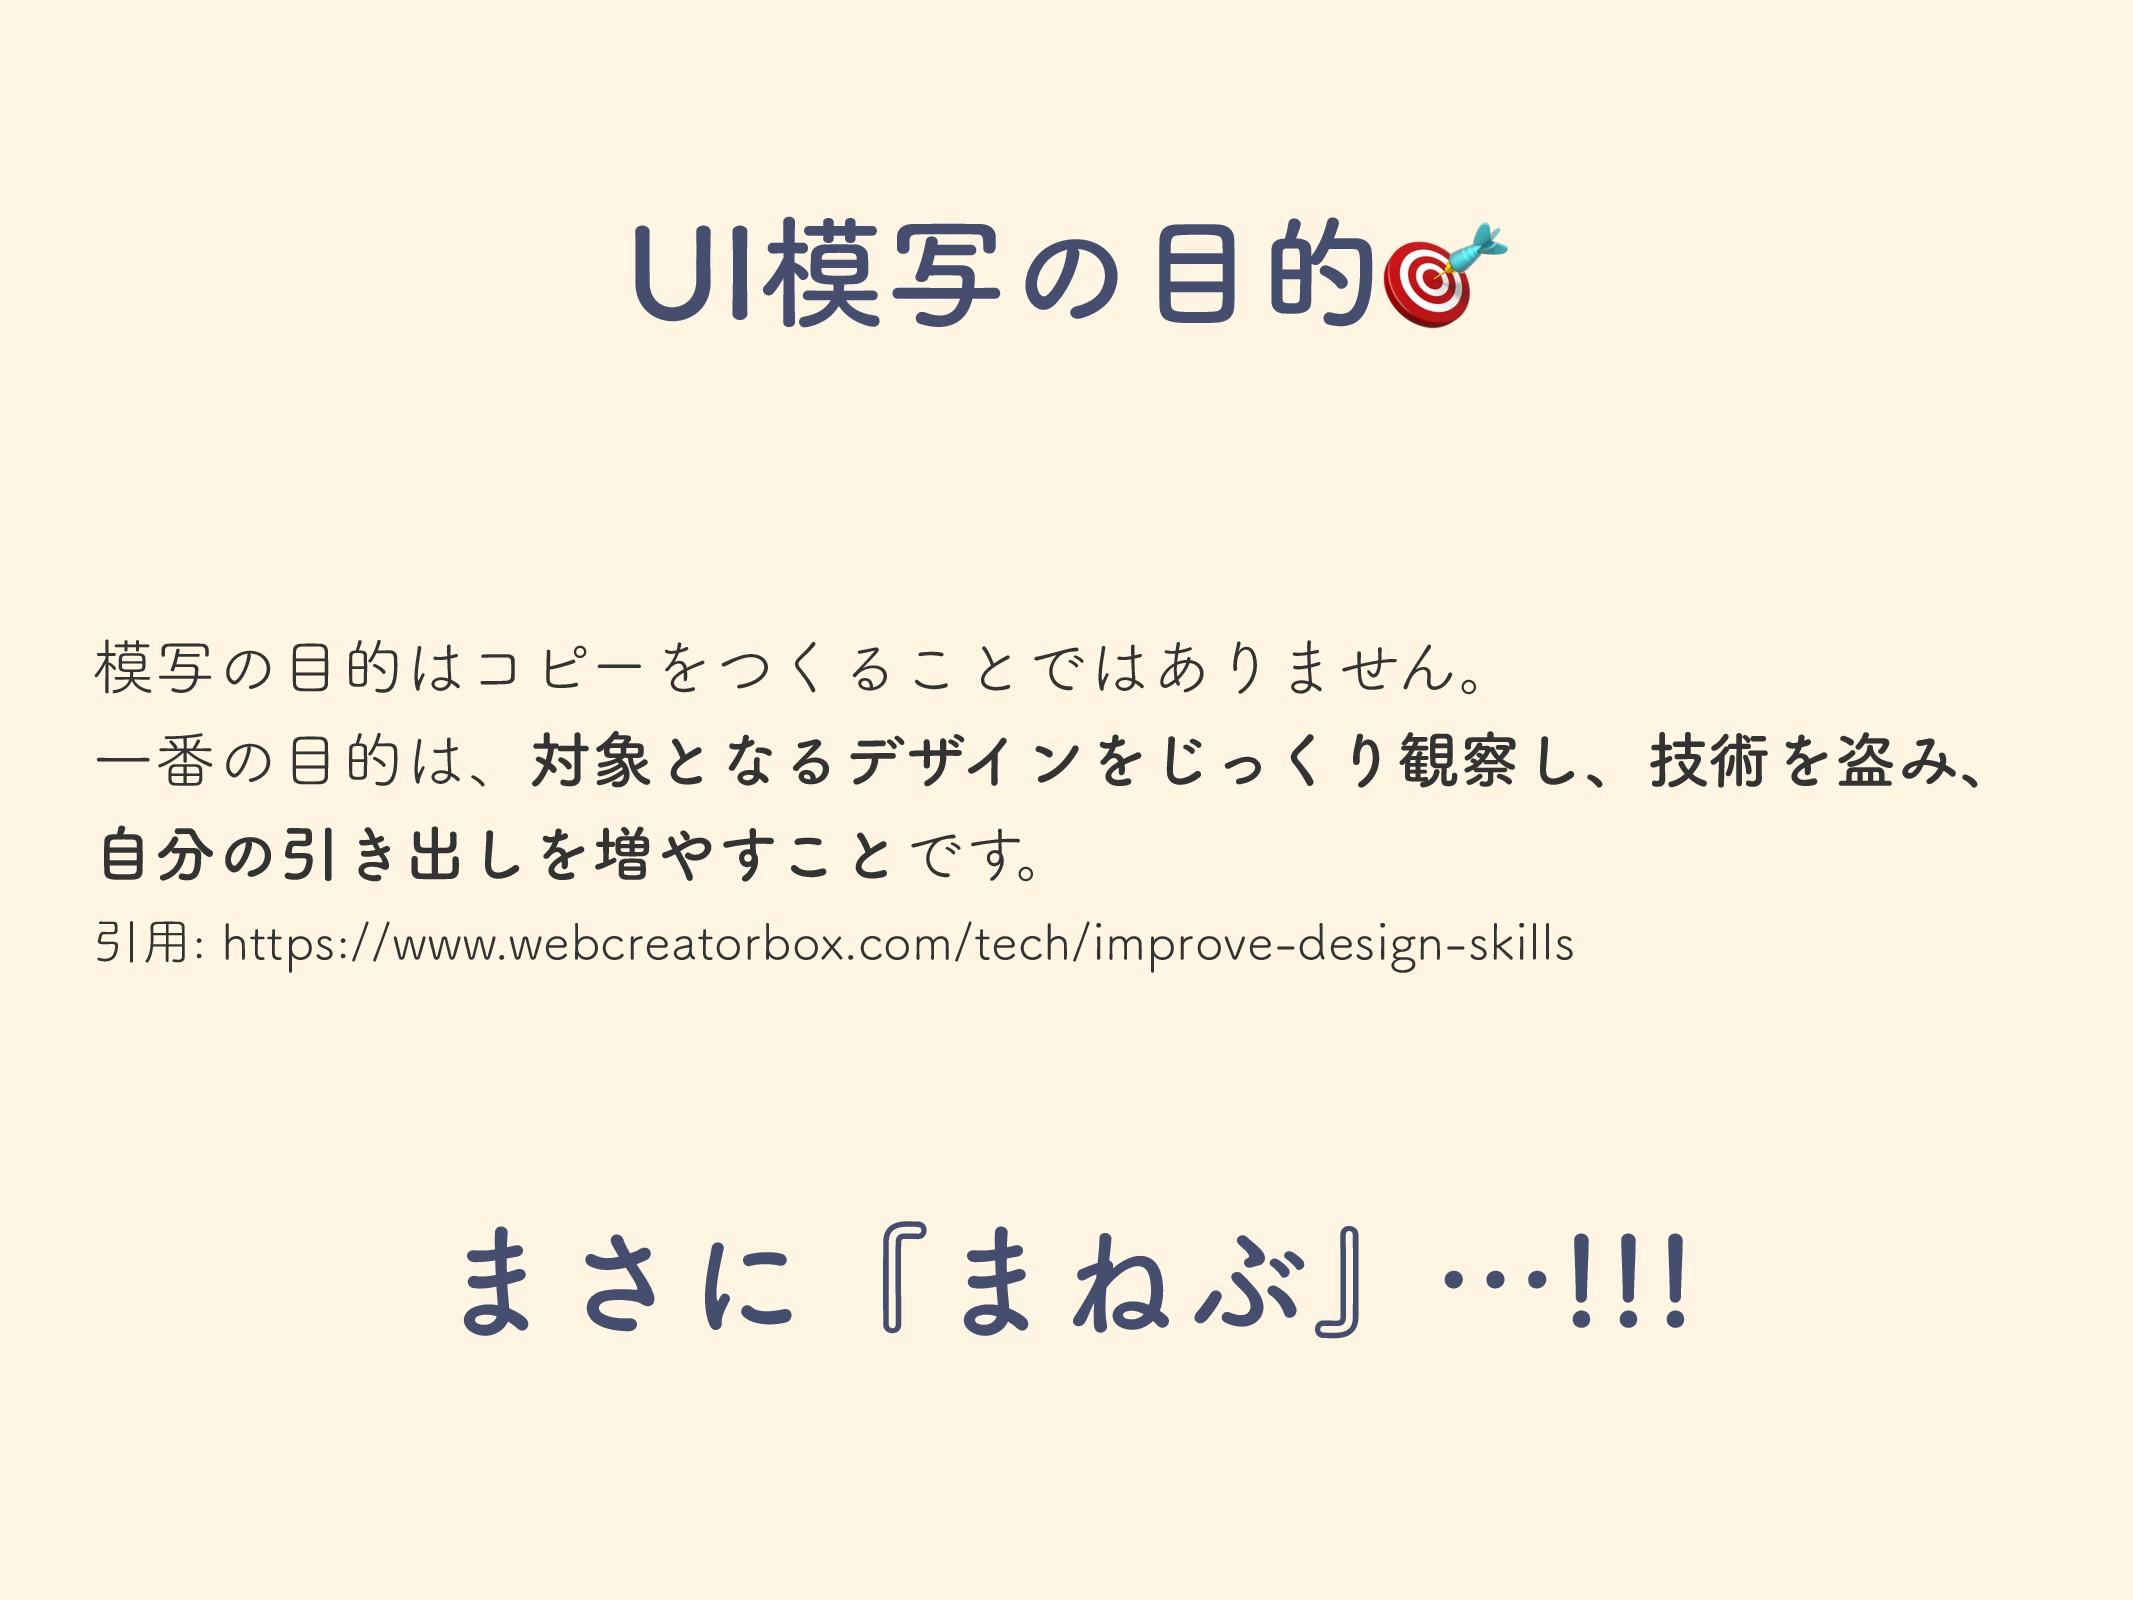 6*ࣸͷత ࣸͷతίϐʔΛͭ͘Δ͜ͱͰ͋Γ·ͤΜɻ Ұ൪ͷతɺରͱͳΔσβ...